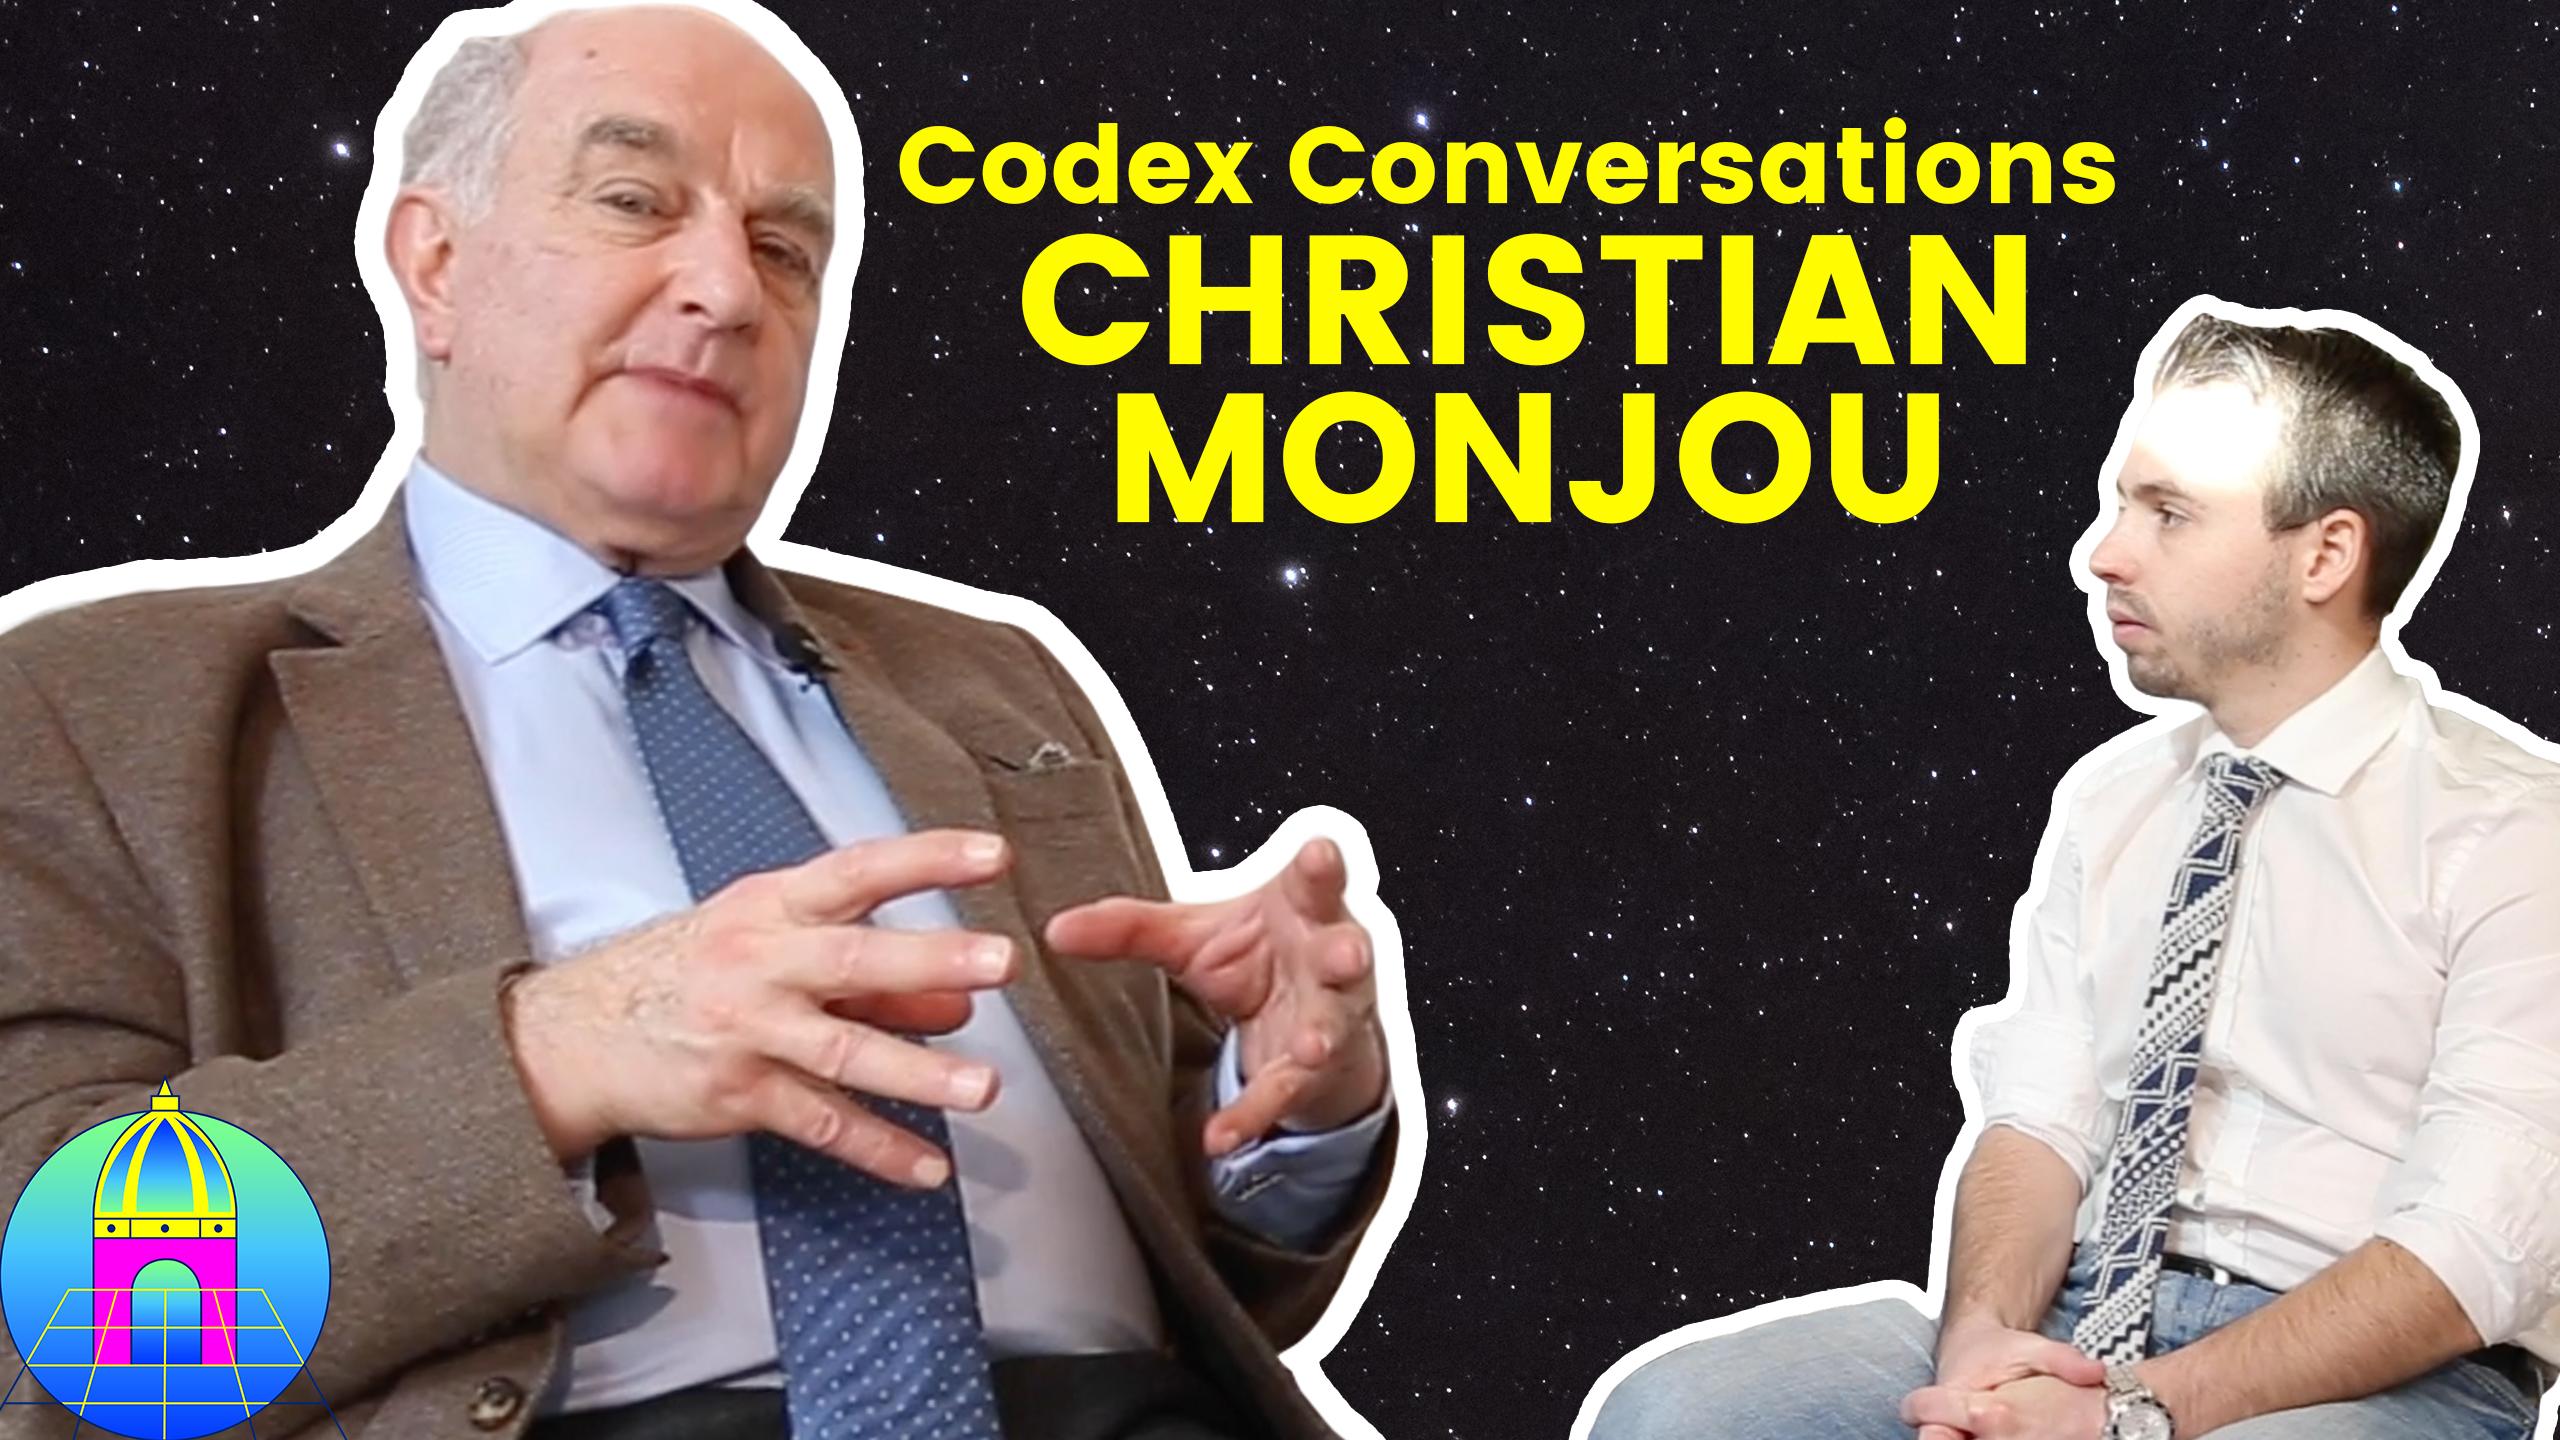 CODEX CONVERSATIONS 04 ✖️ CHRISTIAN MONJOU